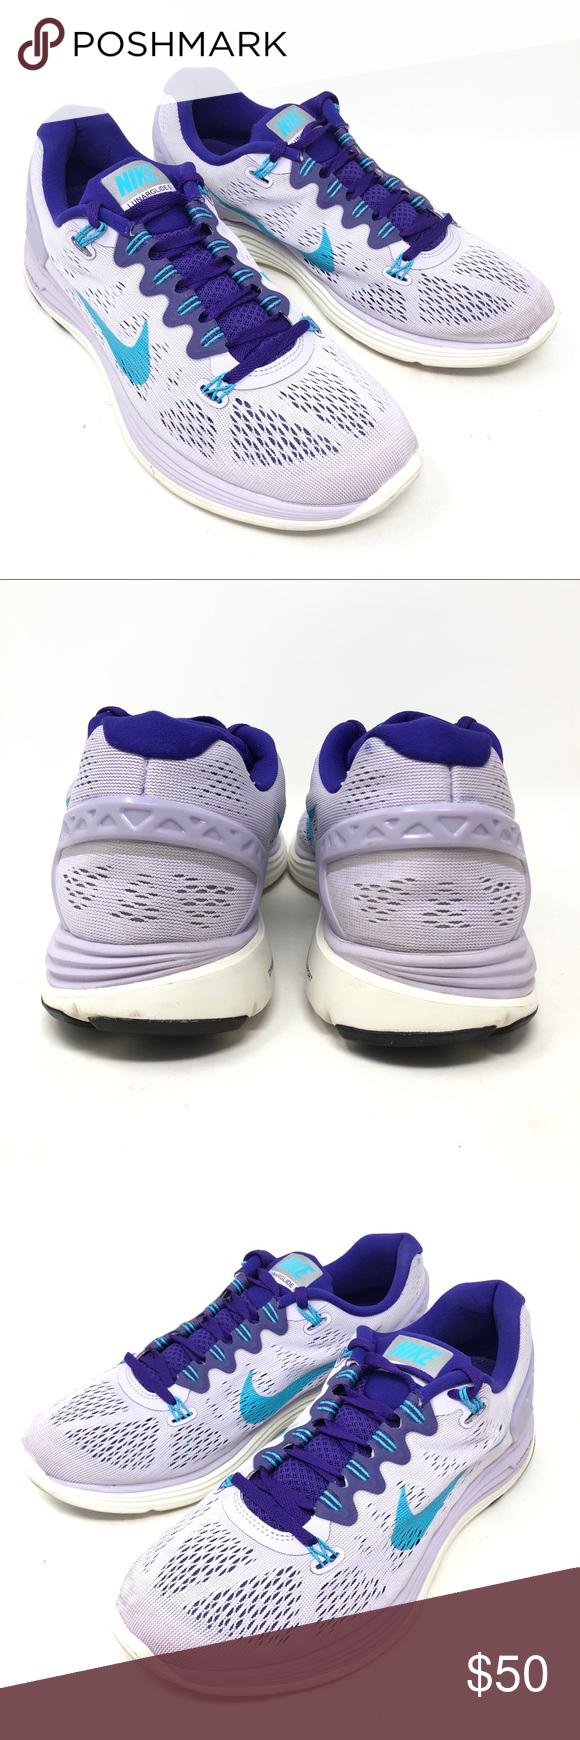 9b087b68750f ... purple with aqua  Nike Lunarglide 5 Violet Frost Running Shoes Nike  599395-545 Lunarglide 5 Violet Frost Running ...